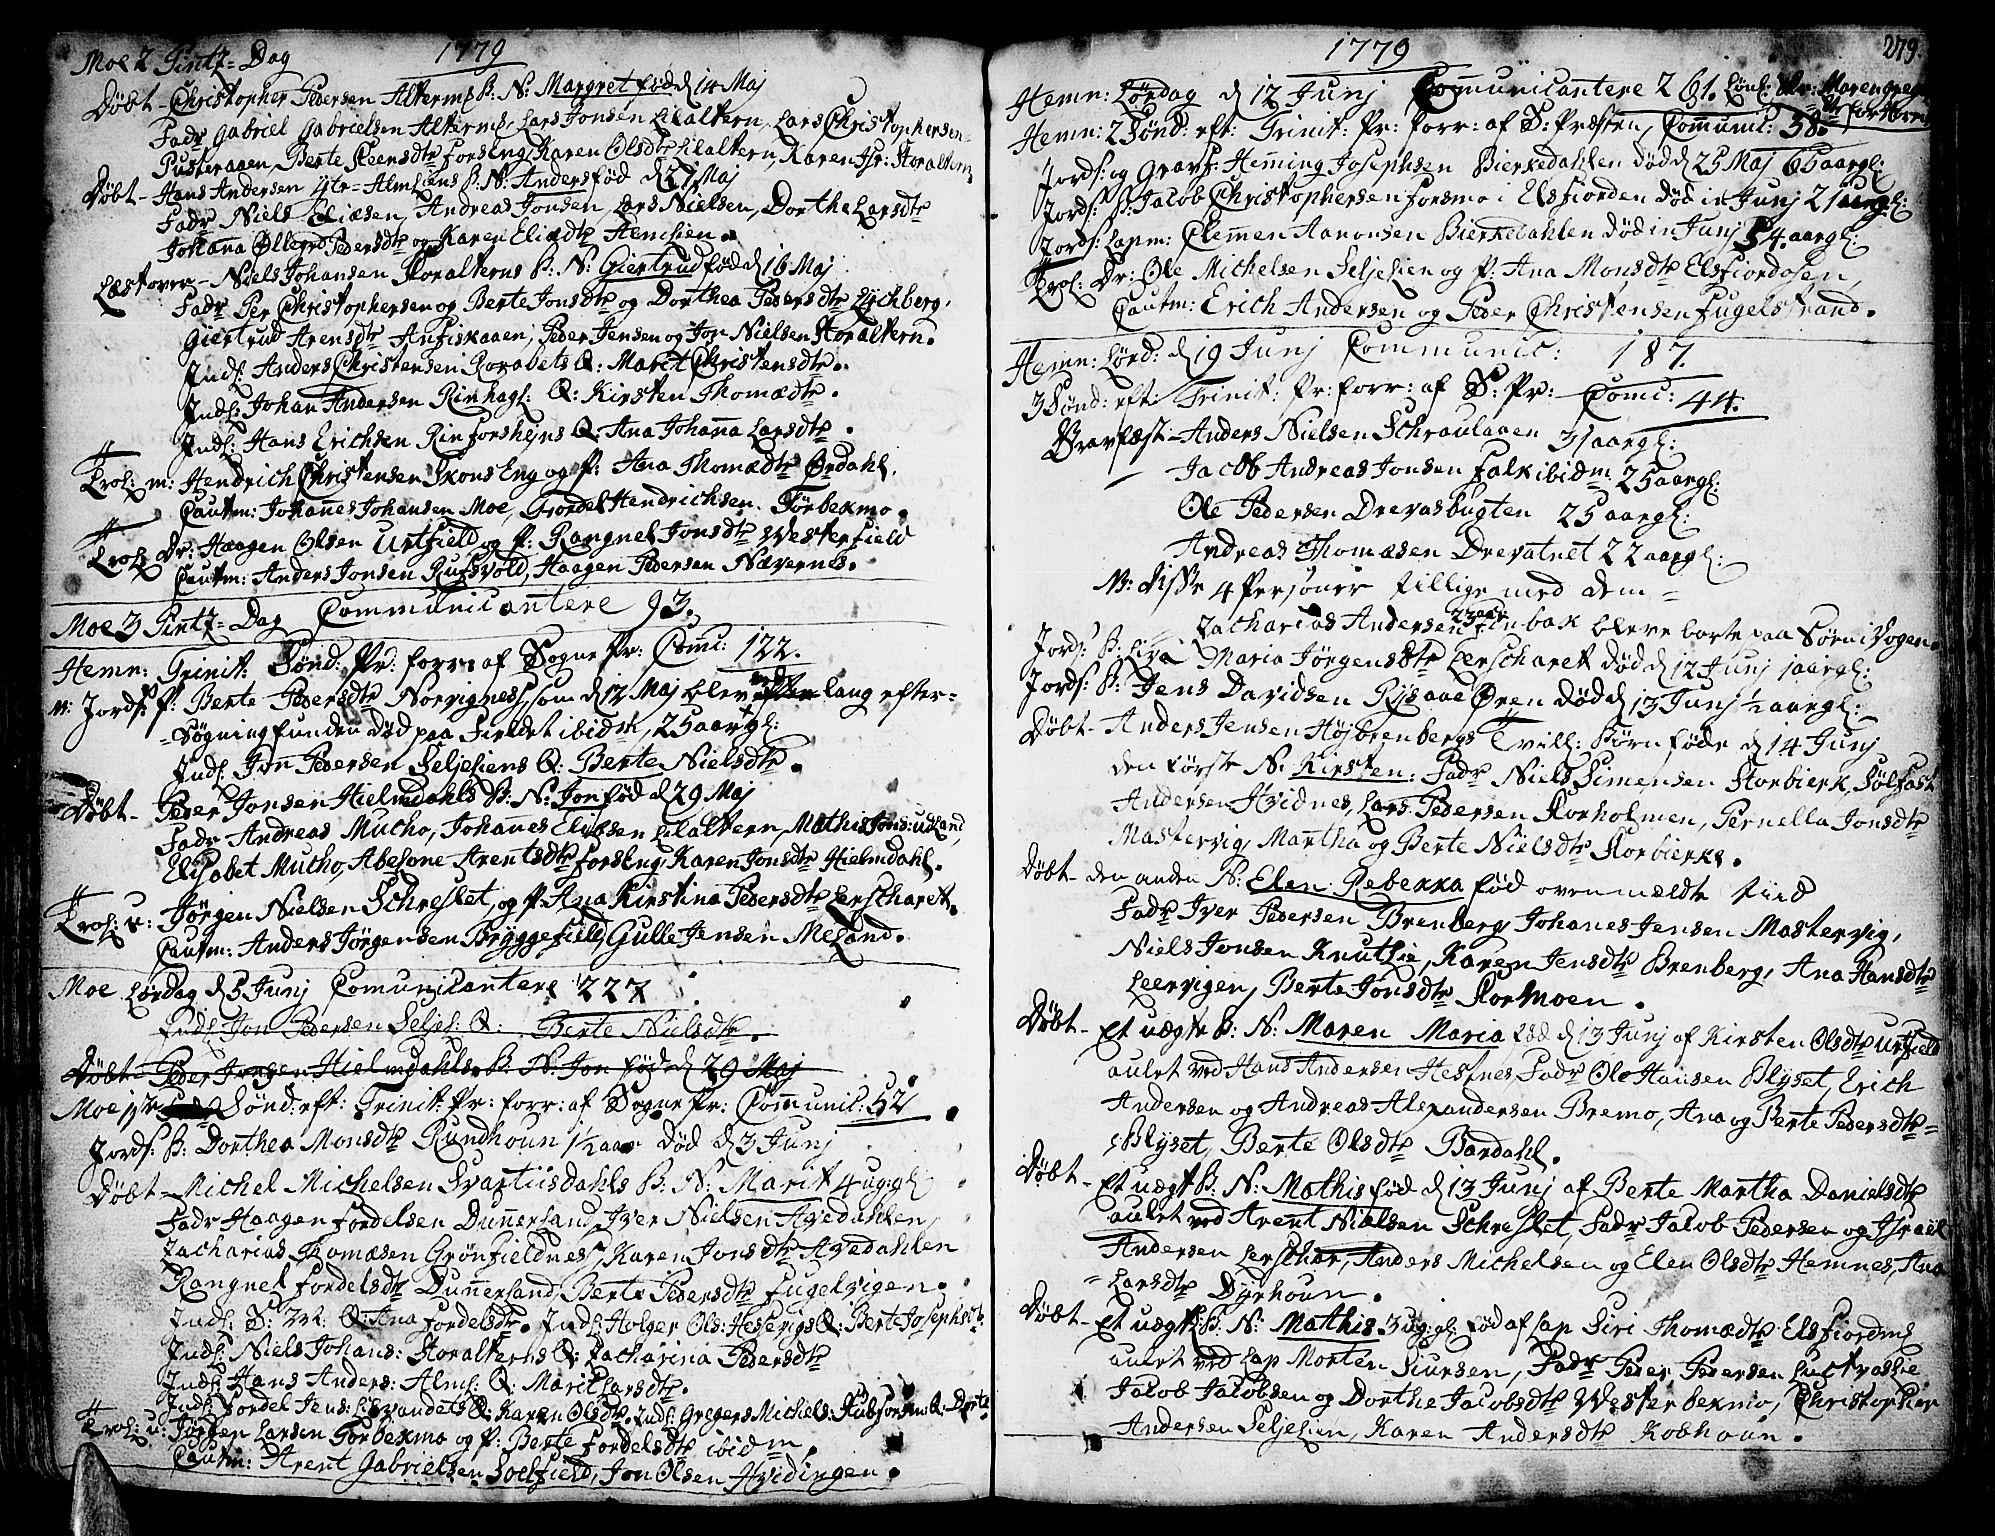 SAT, Ministerialprotokoller, klokkerbøker og fødselsregistre - Nordland, 825/L0348: Ministerialbok nr. 825A04, 1752-1788, s. 279